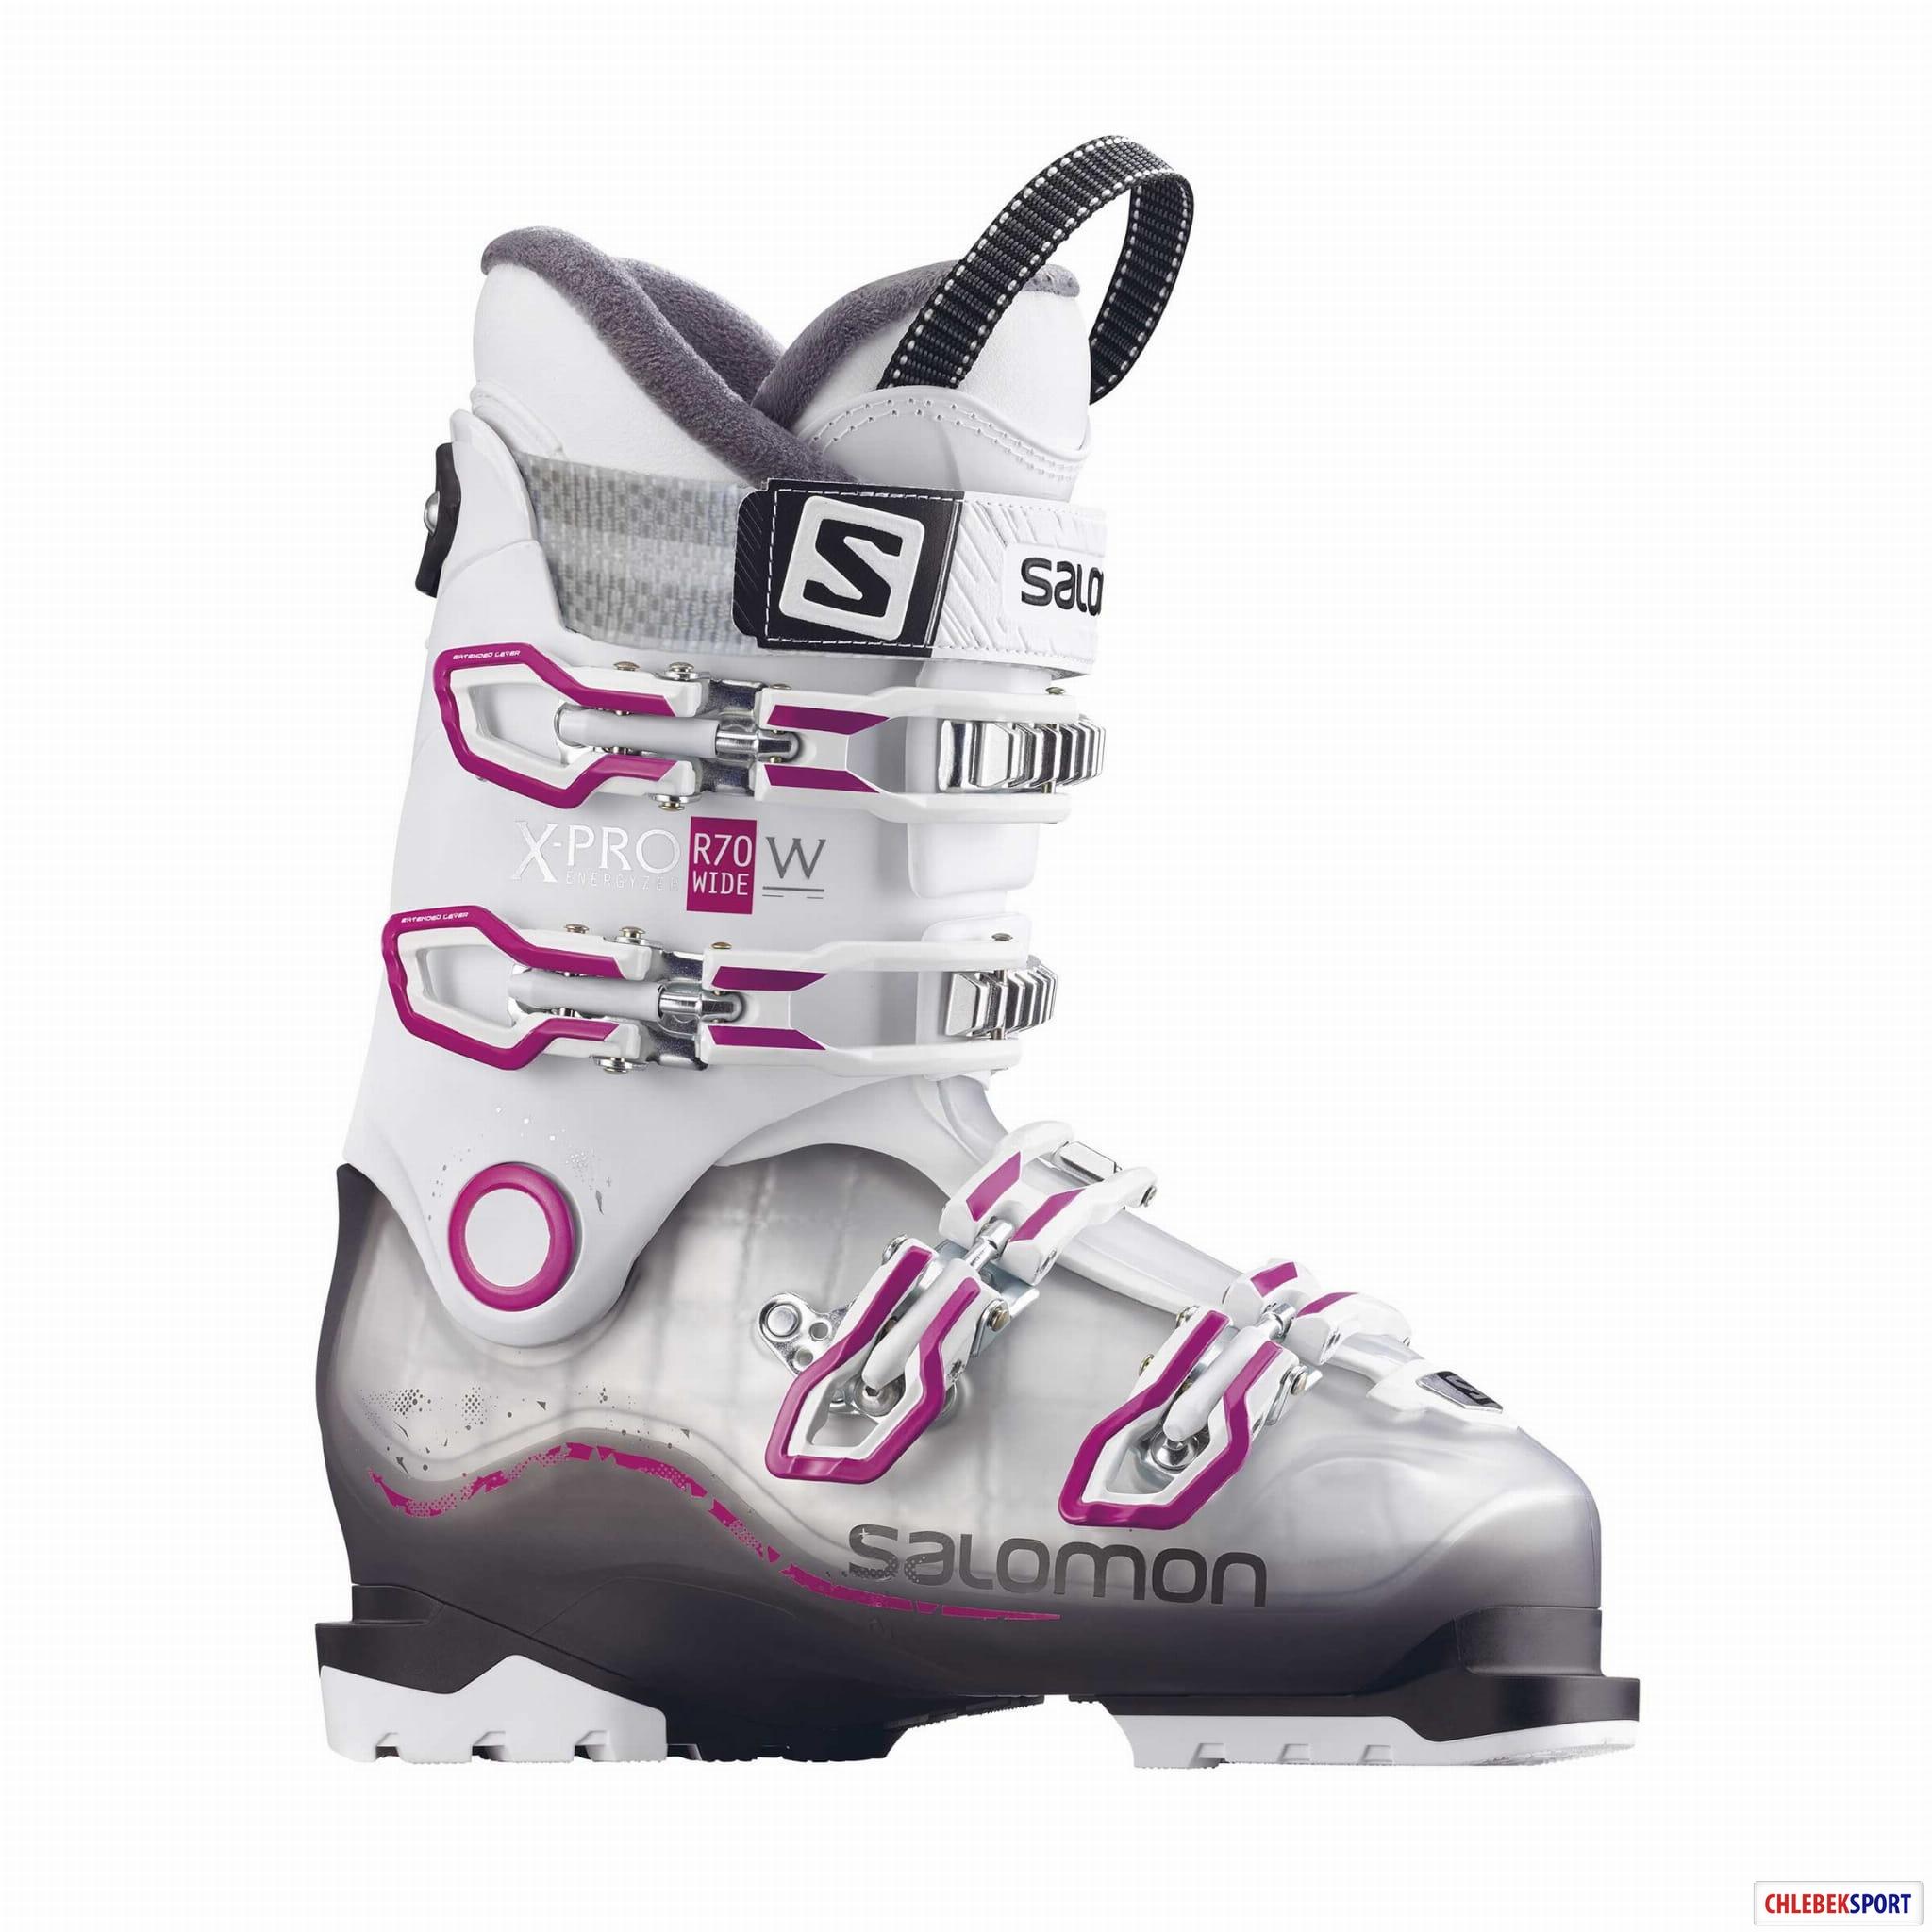 Buty narciarskie Salomon XPRO R70 Wide W 2017[BN152]